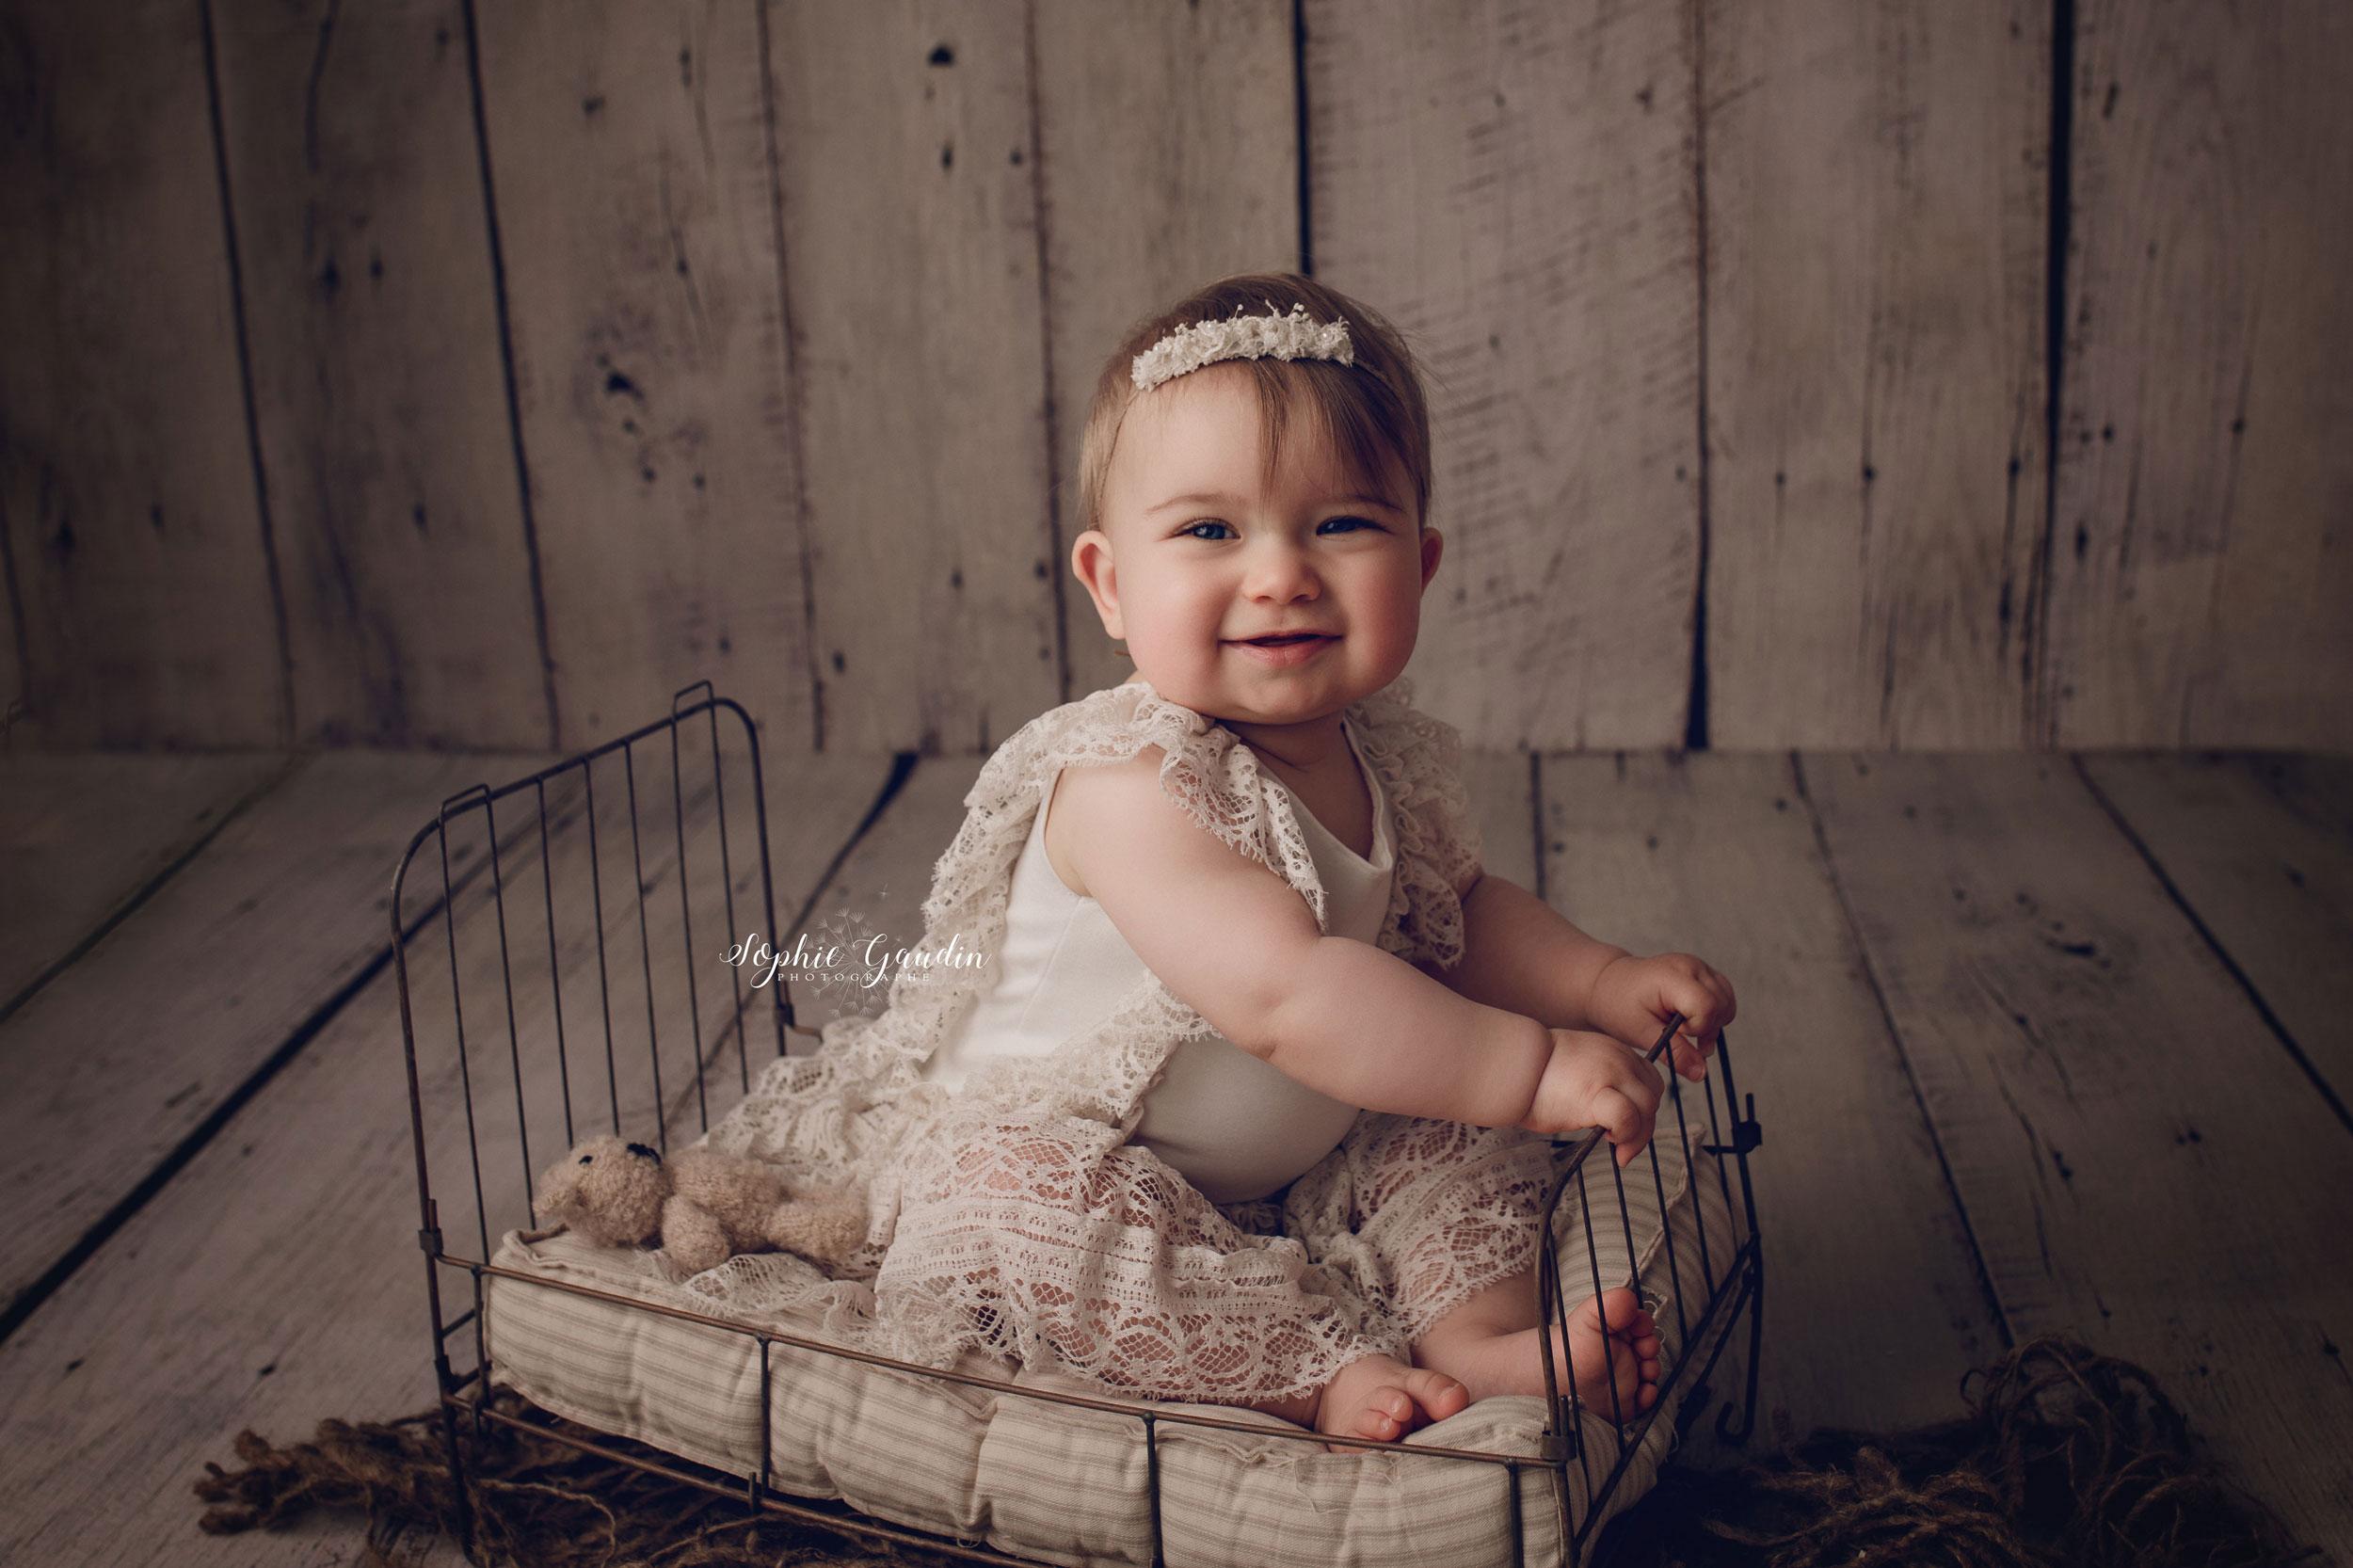 photographie-artistique-bebe